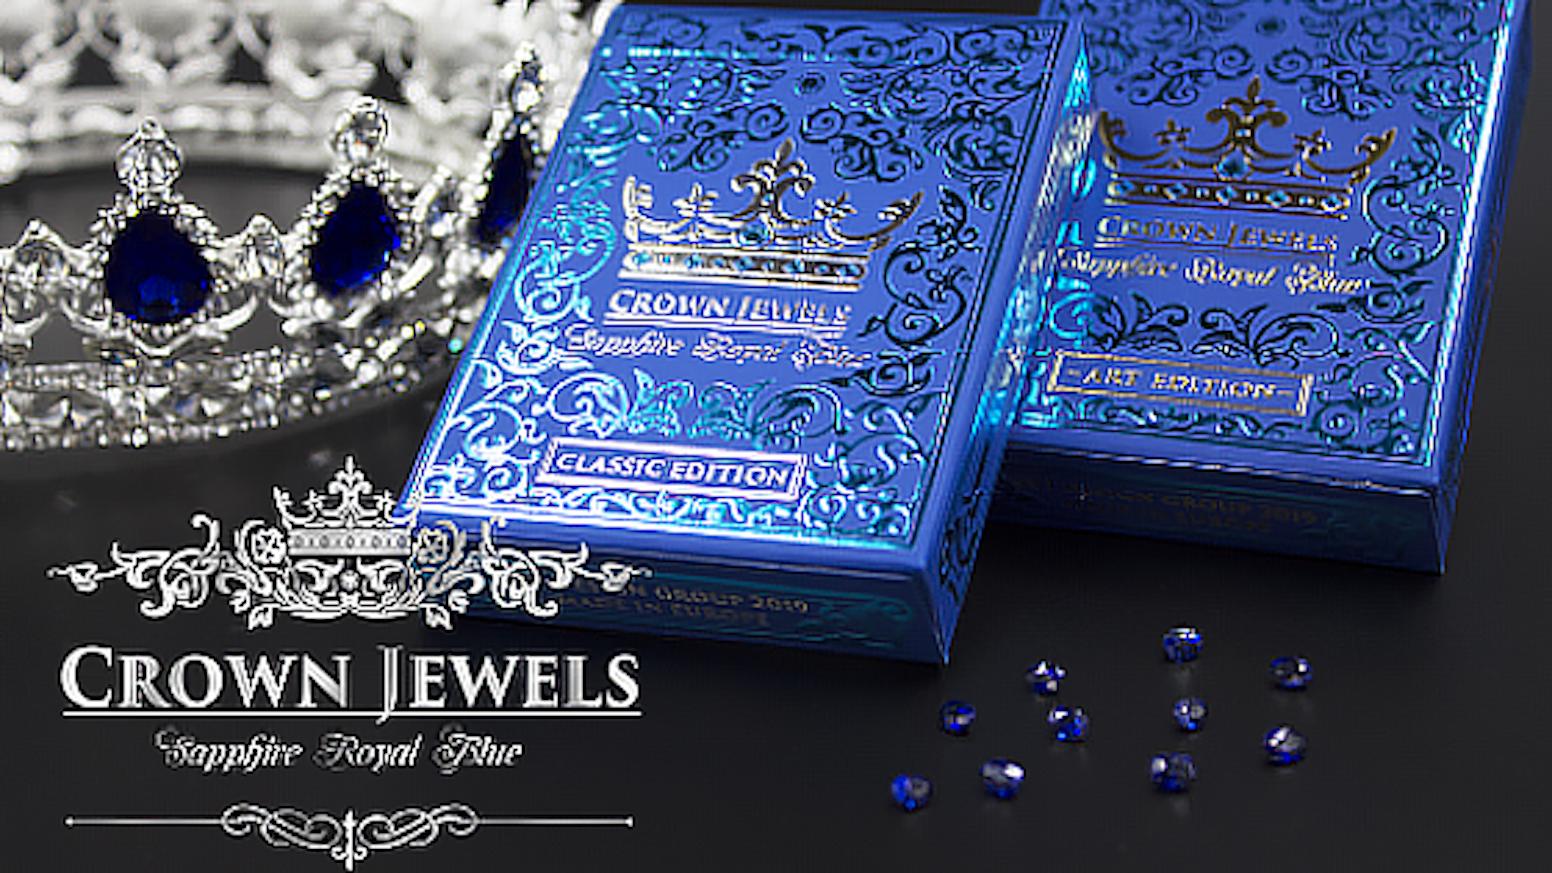 Sapphire royal blue